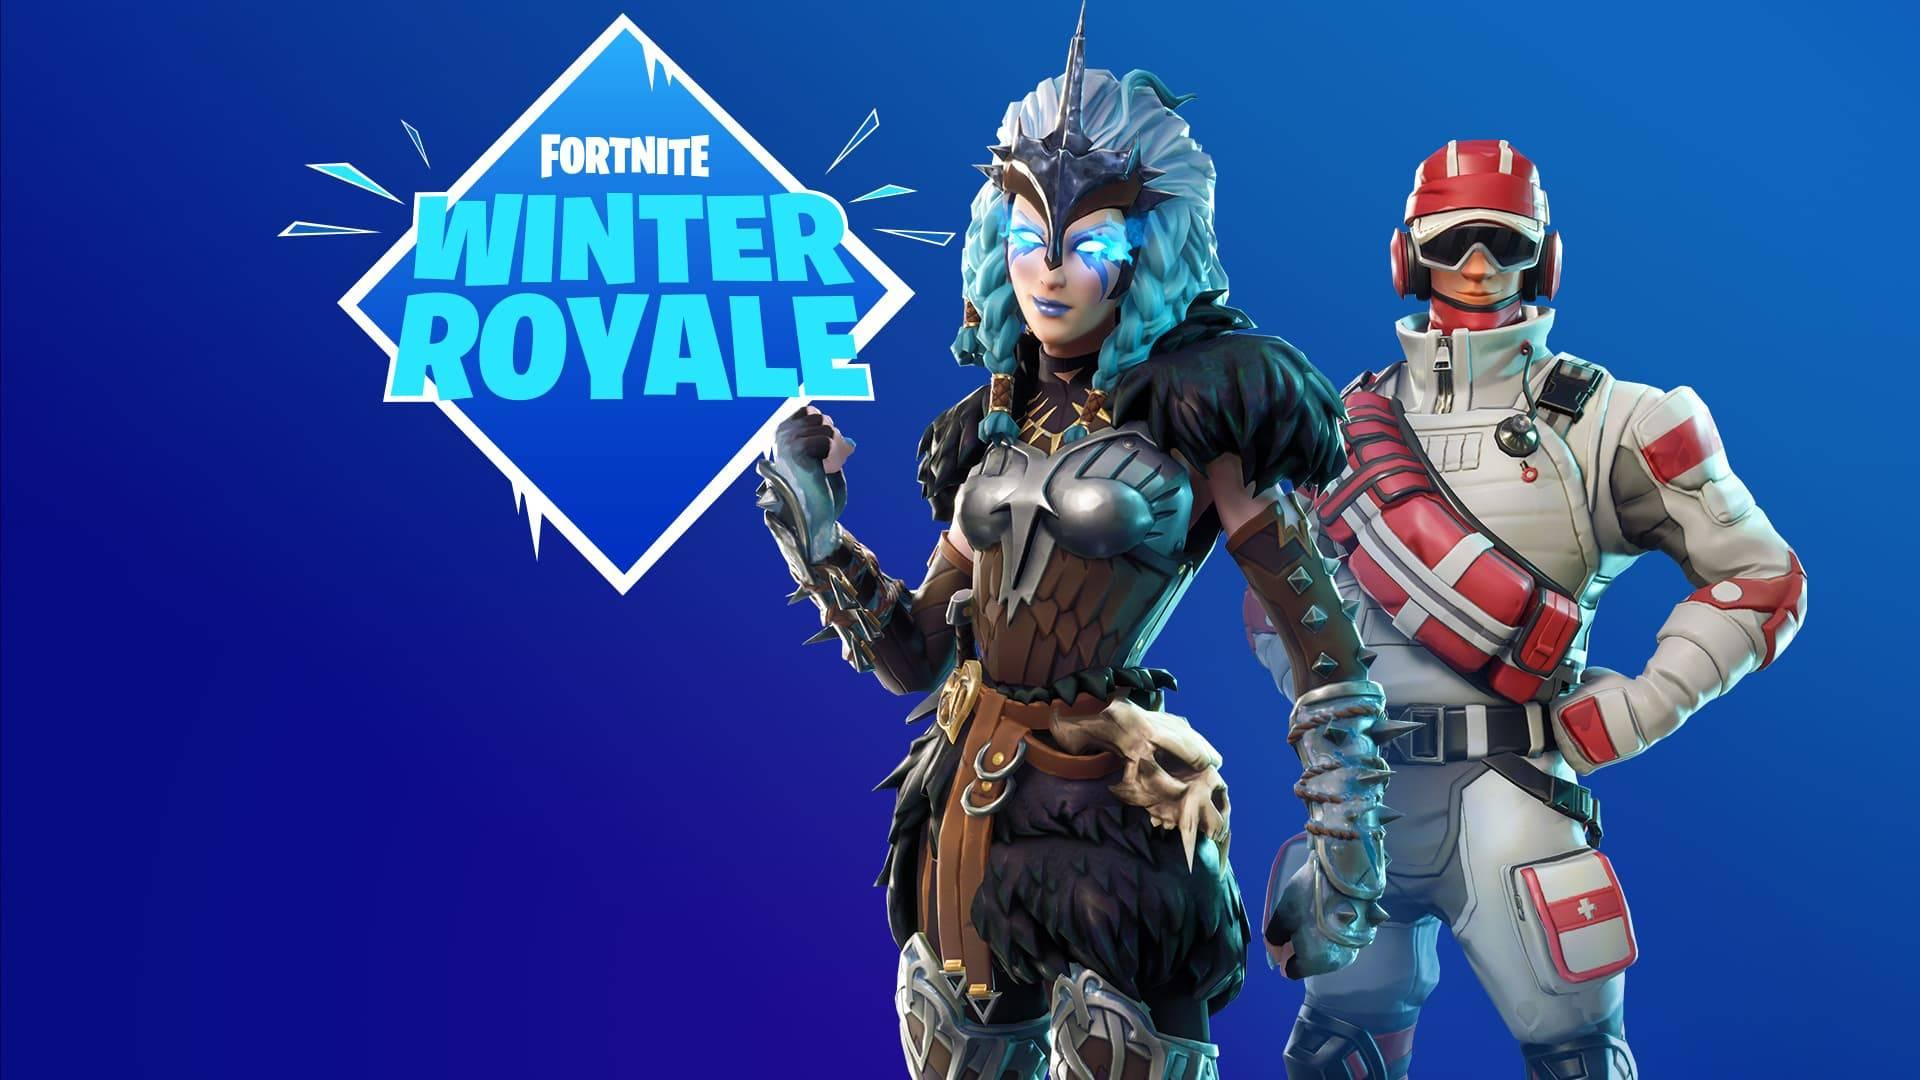 Fortnite Winter Royale torneo